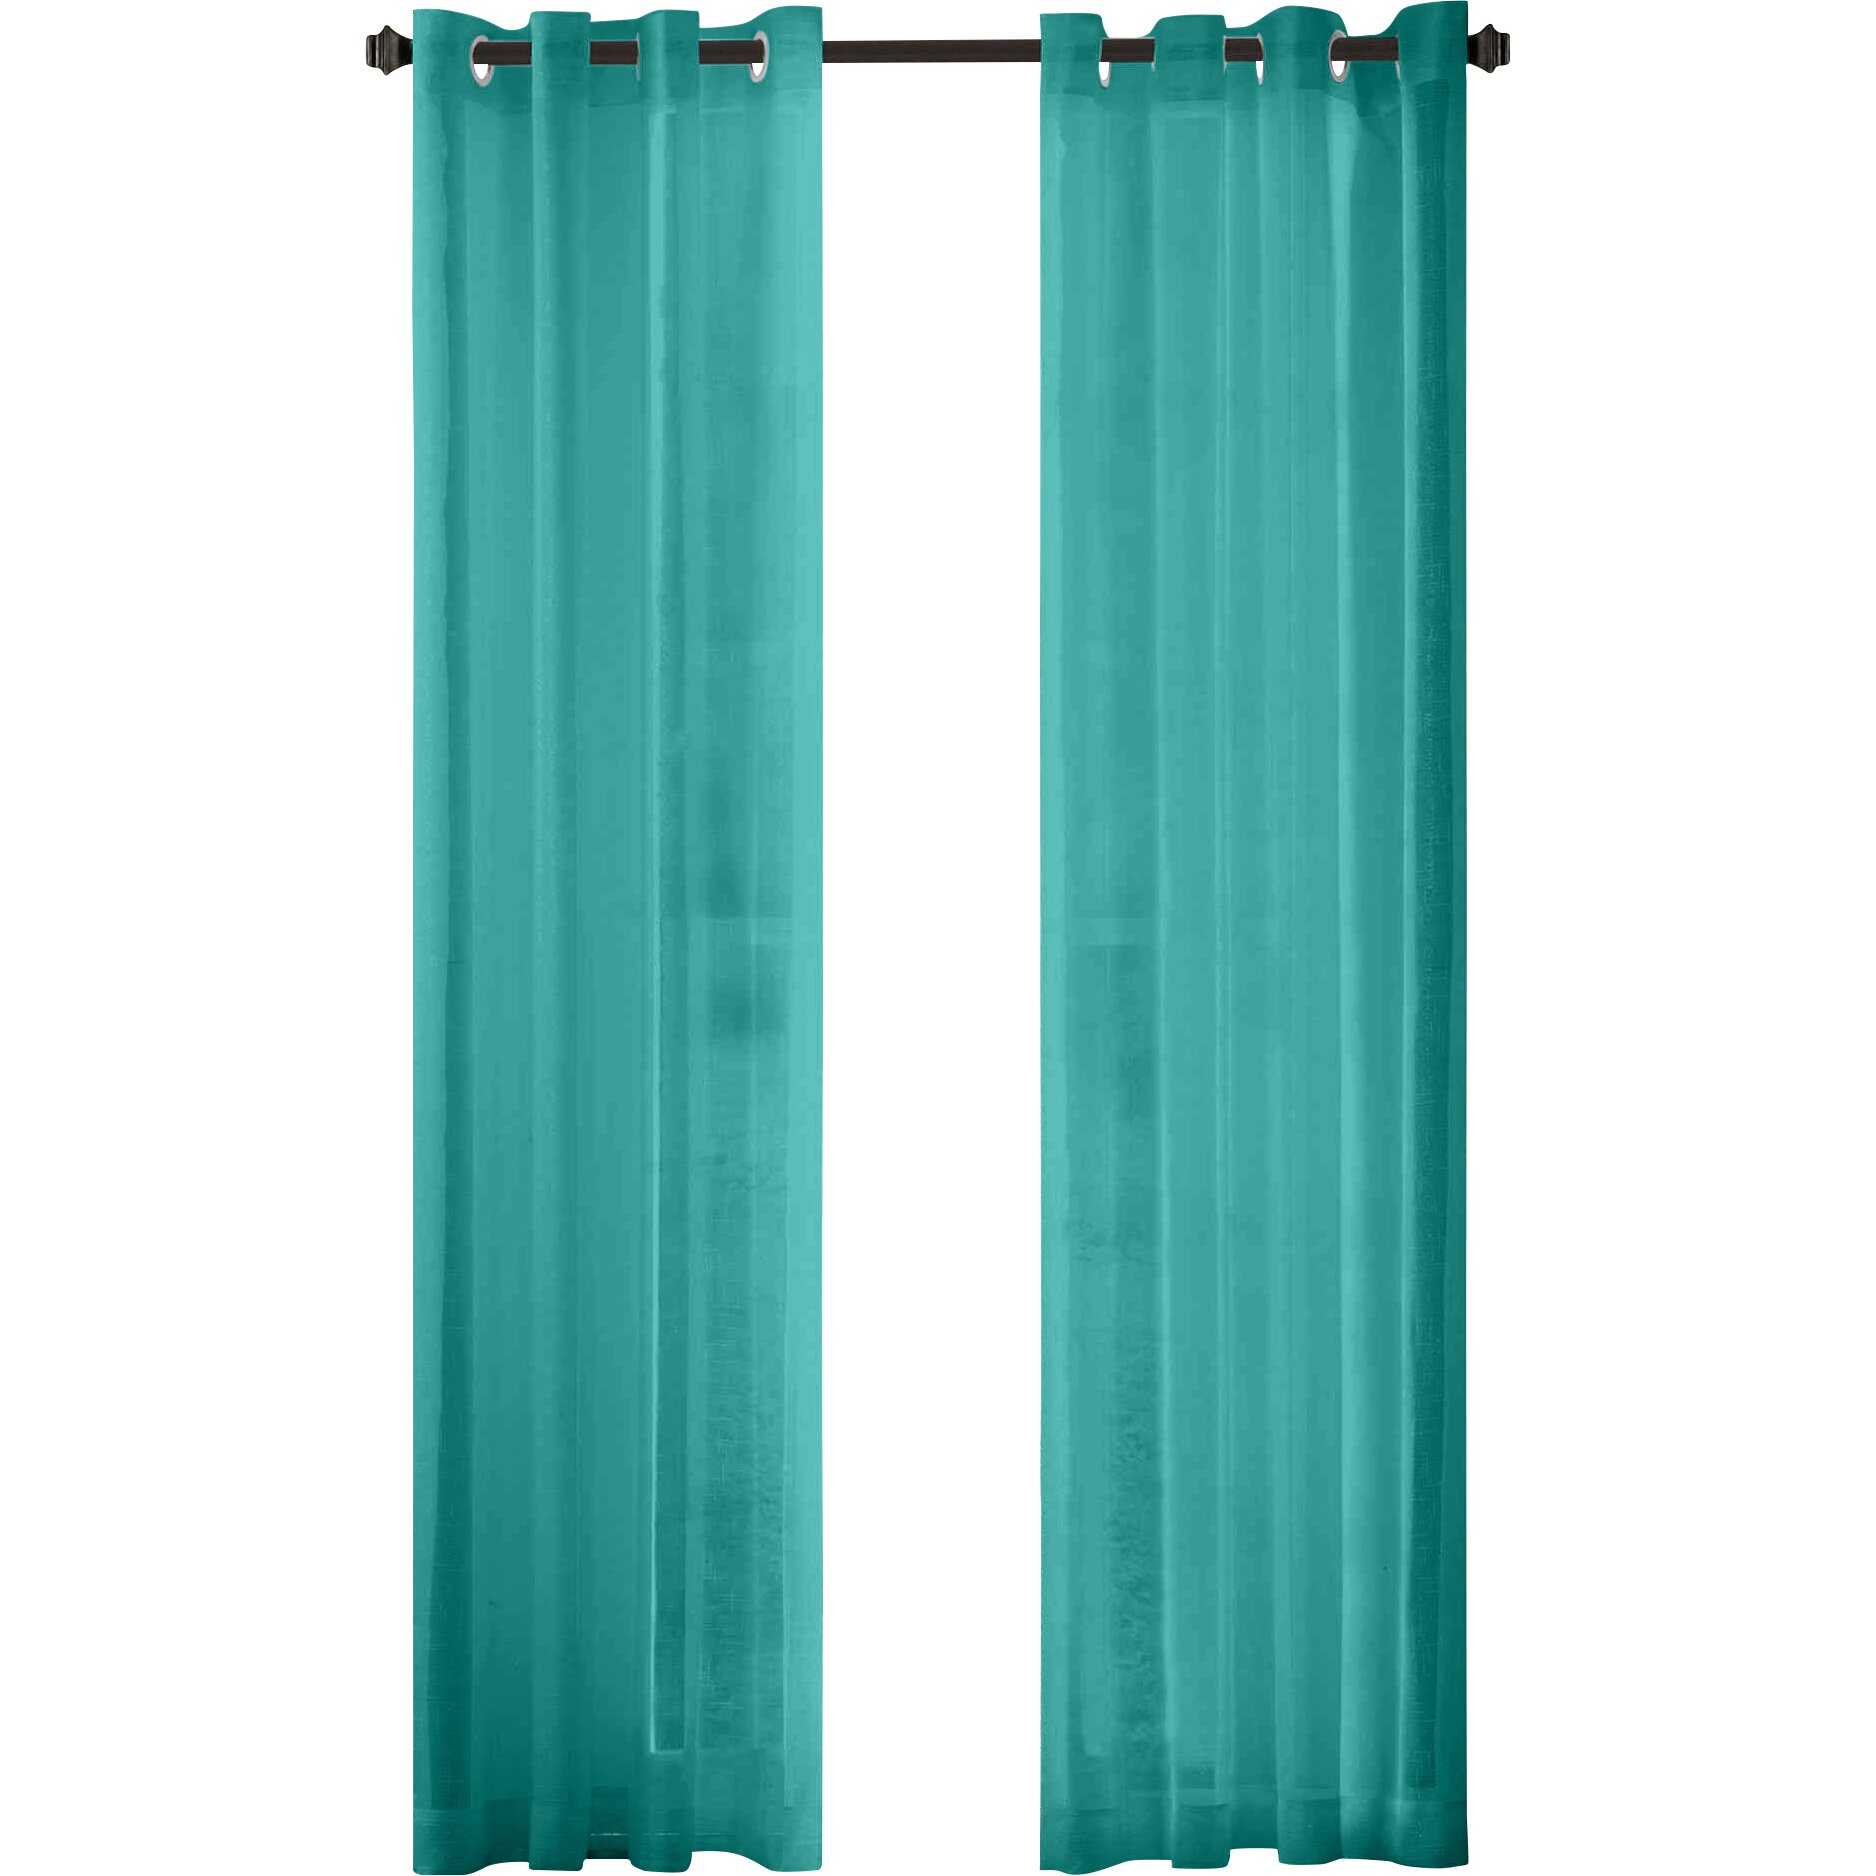 wayfair basics wayfair basics sheer grommet polyester curtain panels